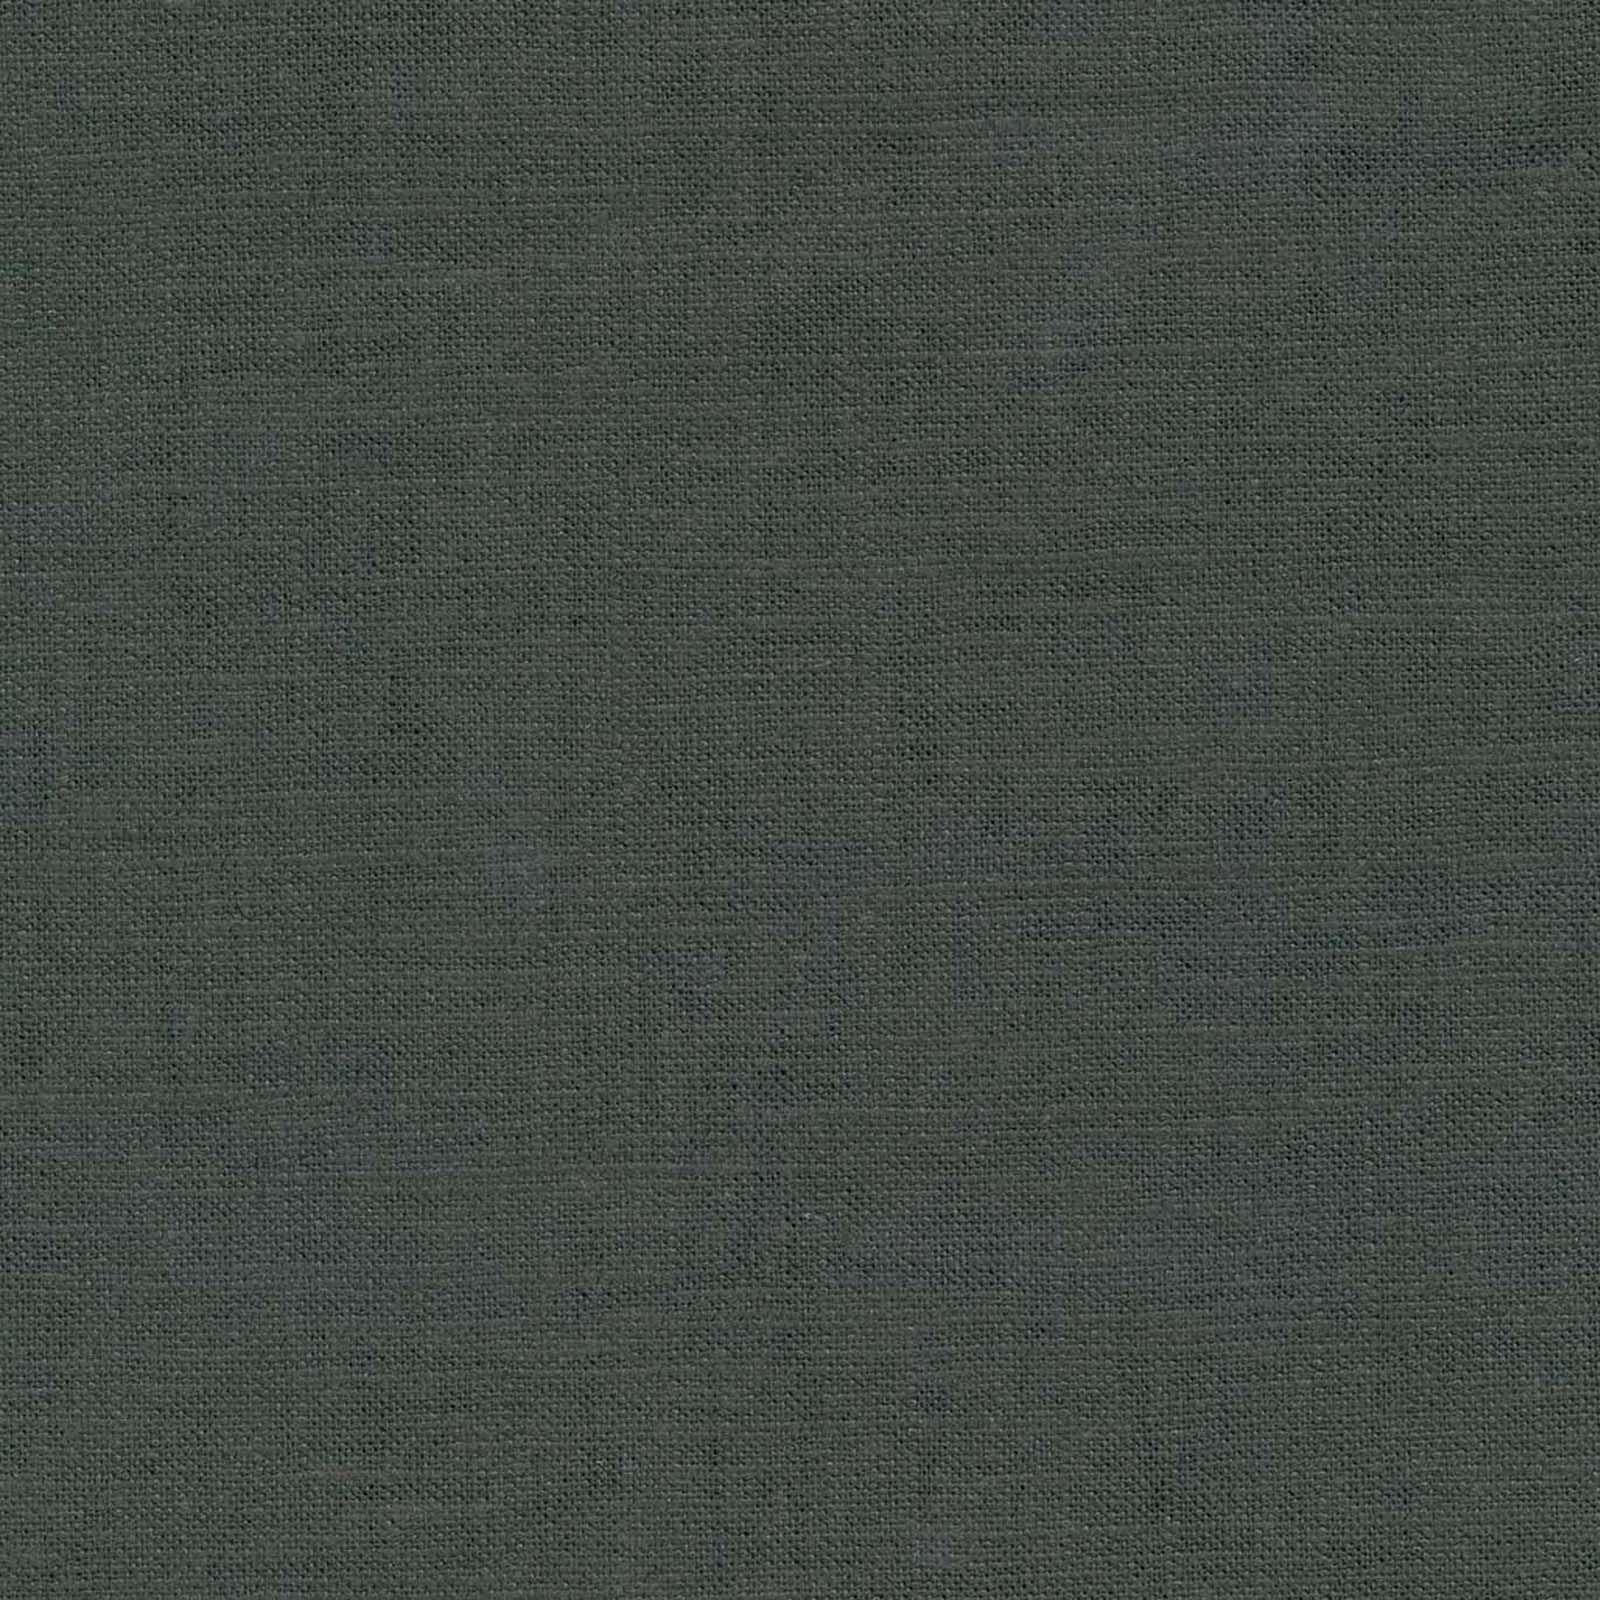 "Signature Series Solid Linen Fabric 54""Charcoal Decor"